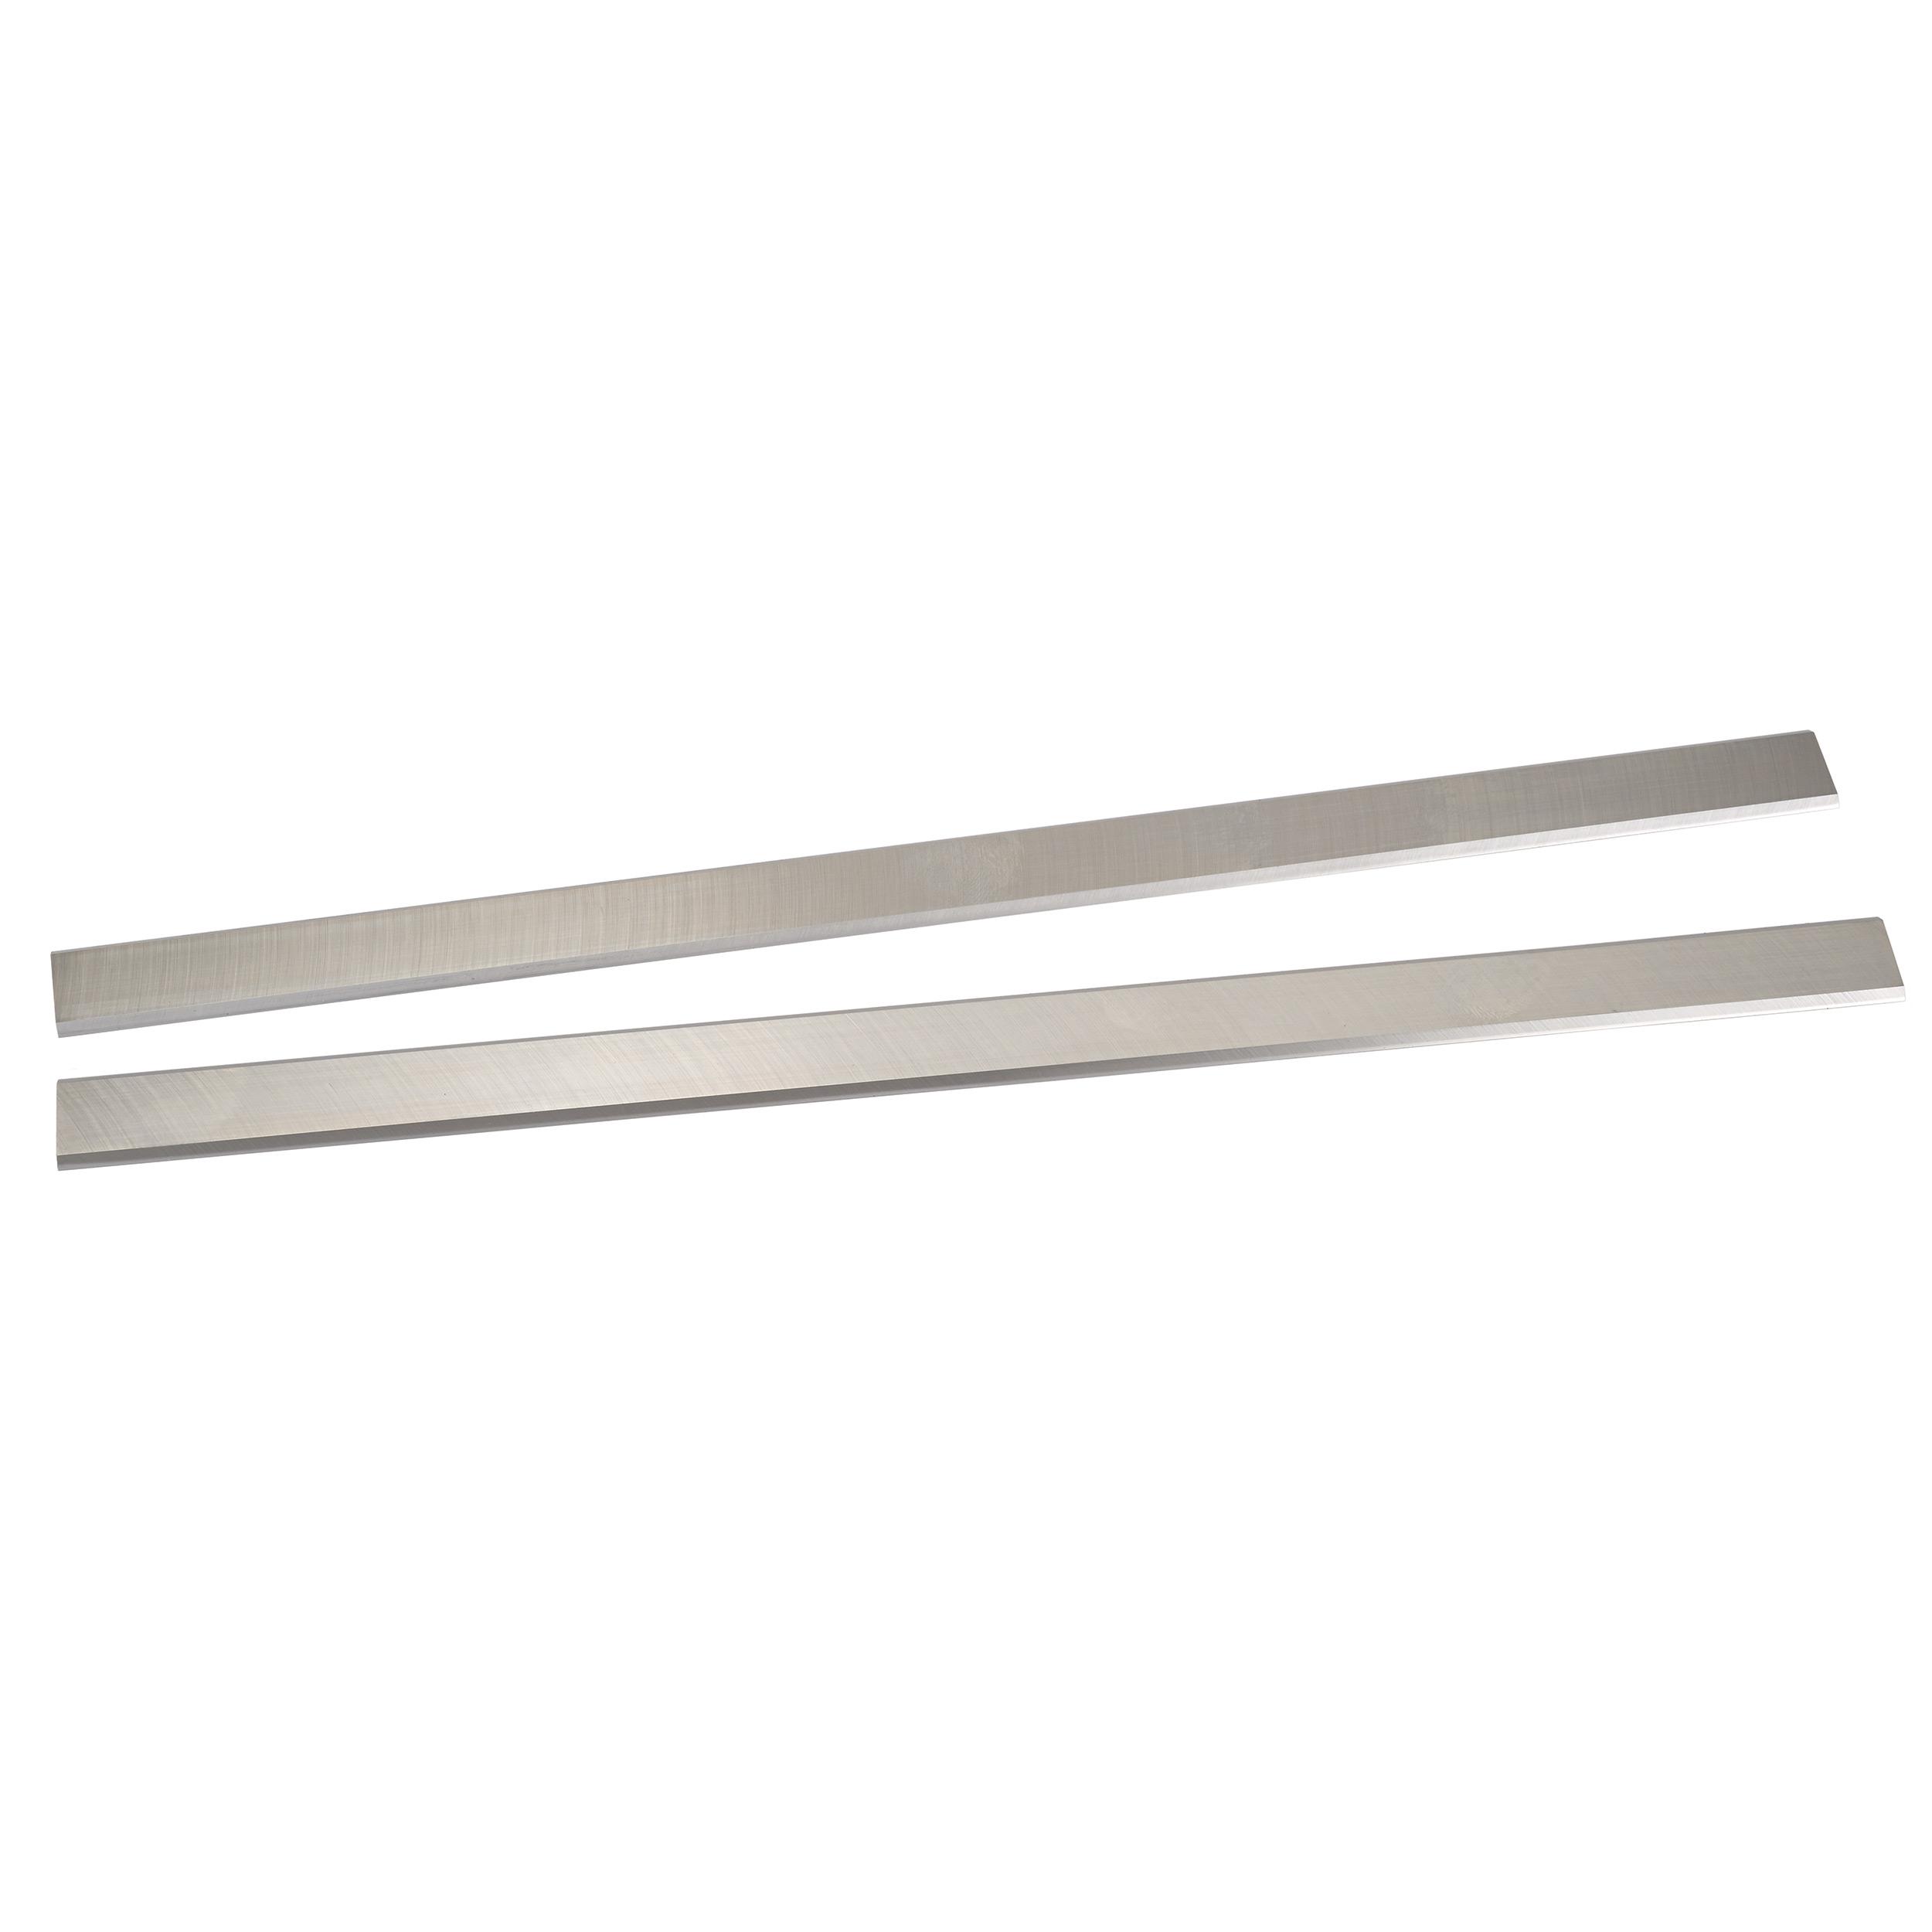 2-Piece Planer Knives for Delta Model 22-580